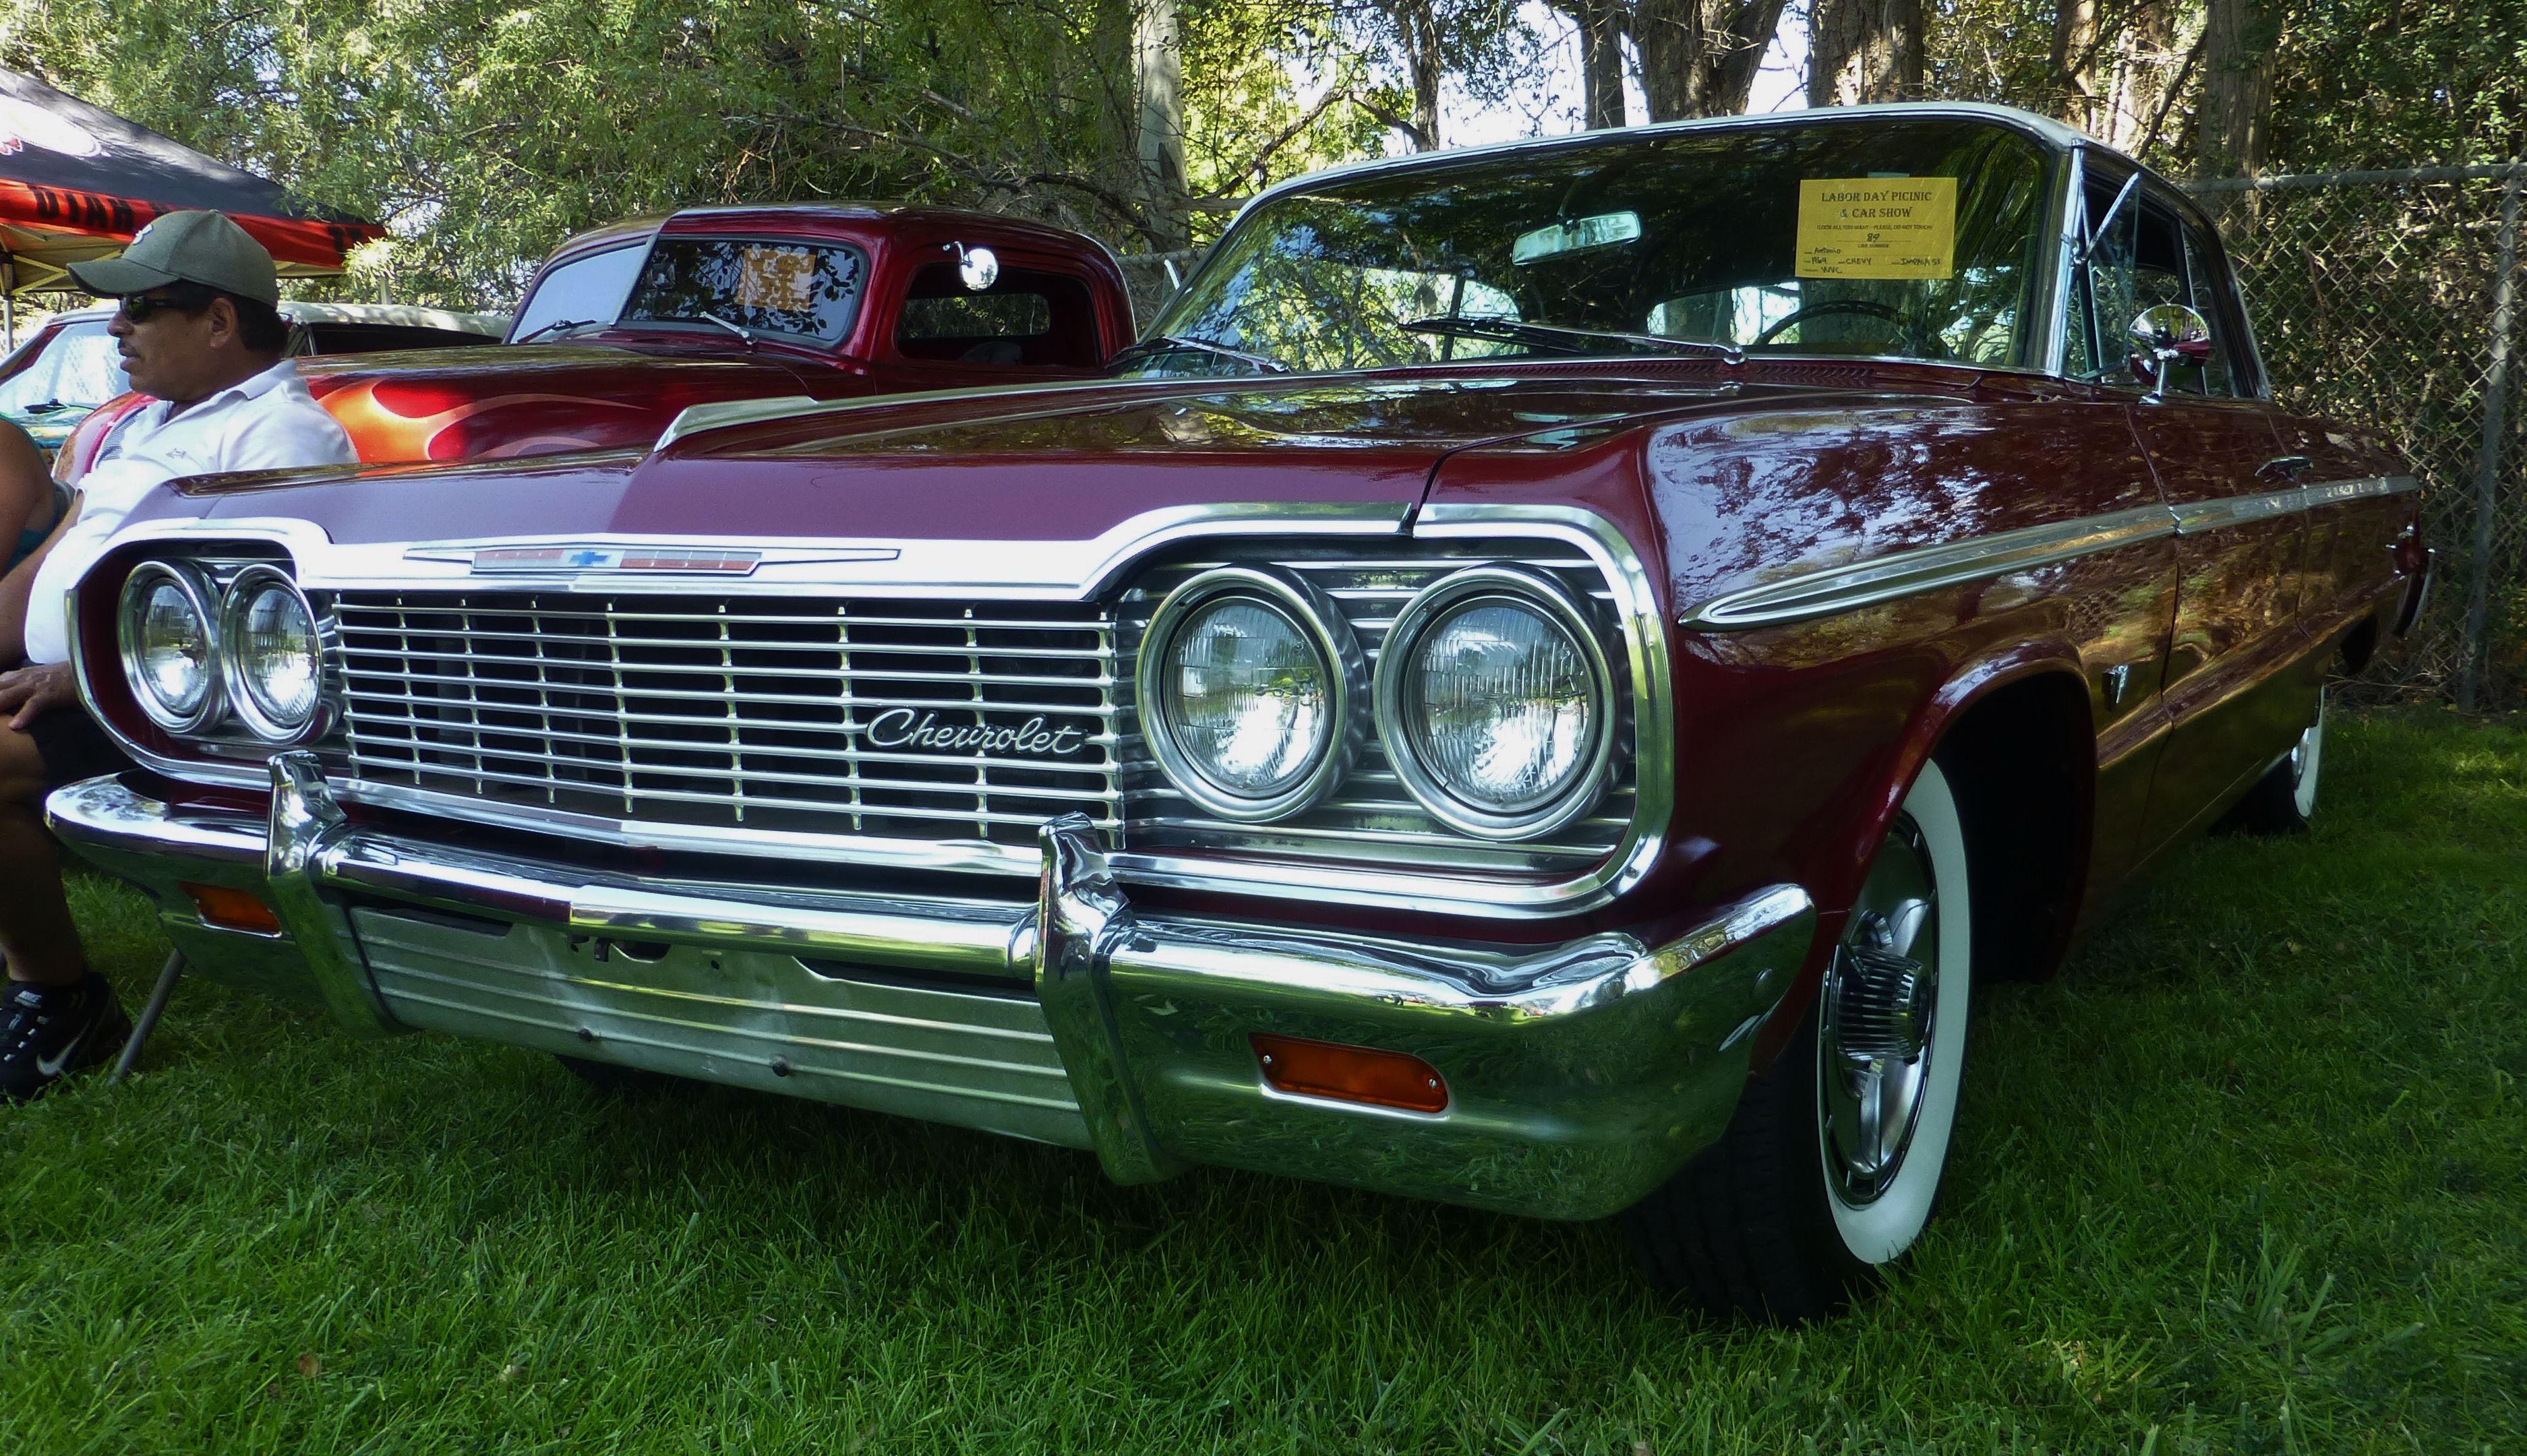 1964 Chevrolet Impala SS. Photography by David E. Nelson, 2017 ...